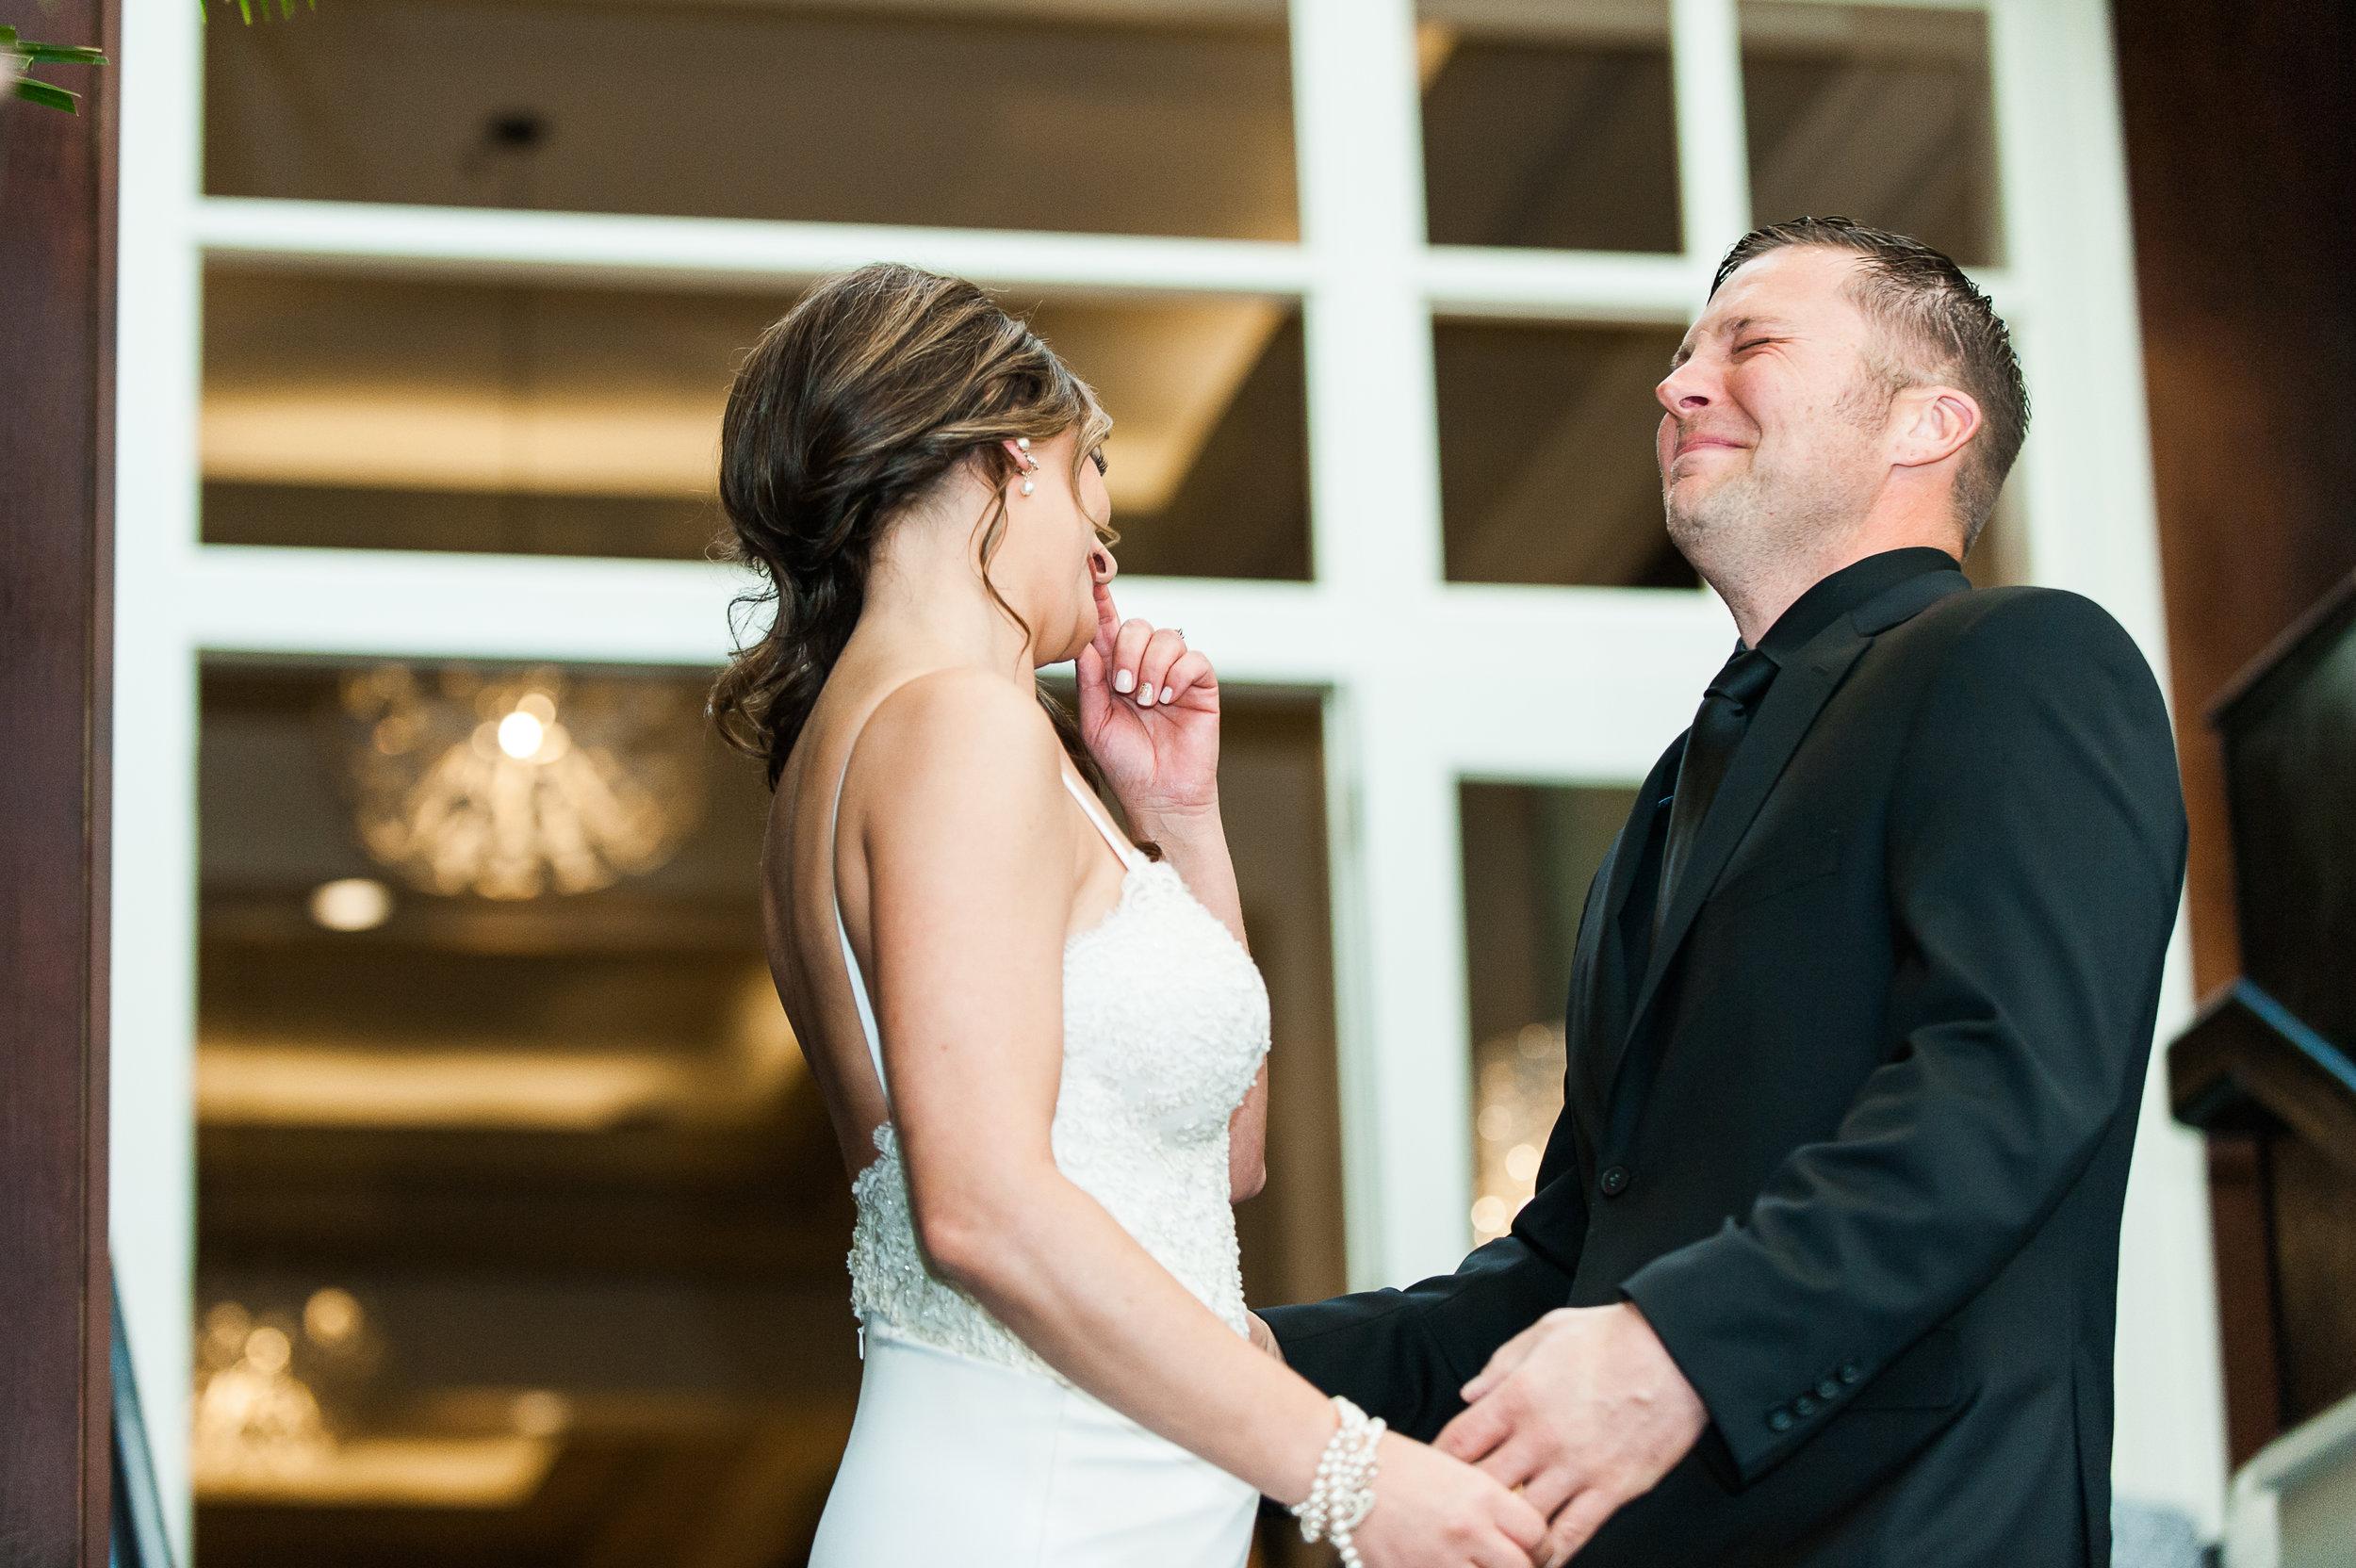 JJ-wedding-Van-Wyhe-Photography-121.jpg